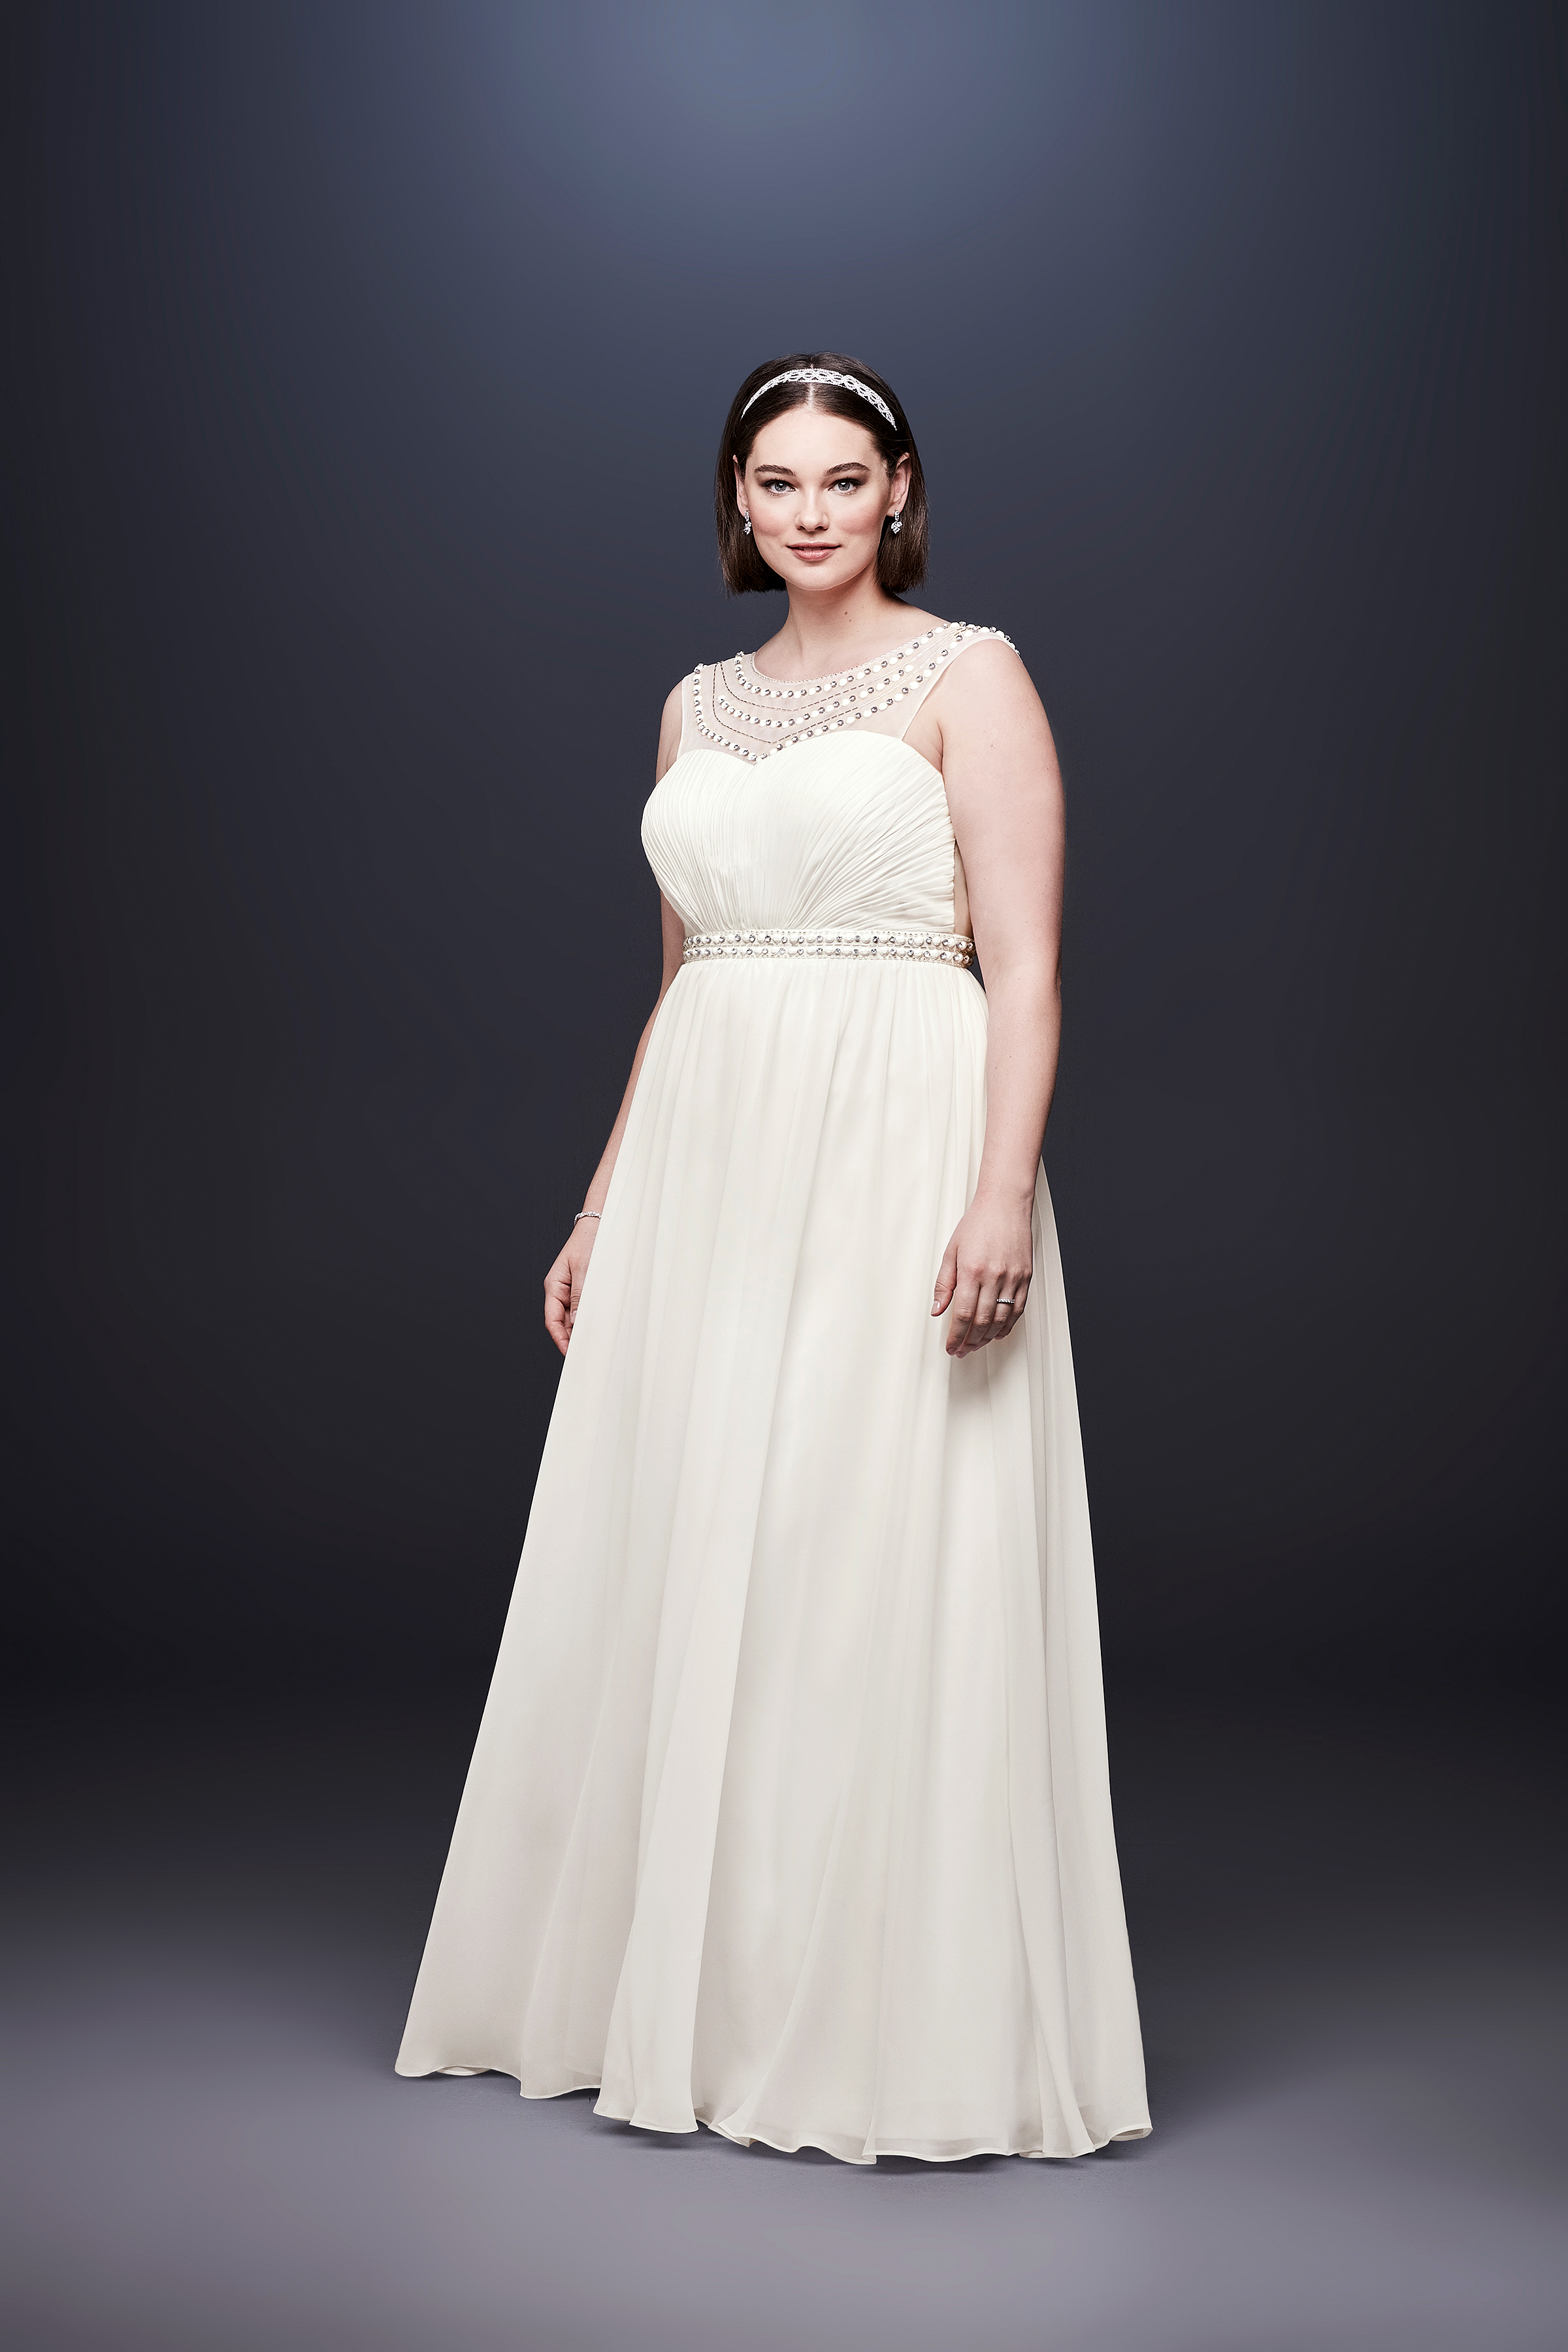 david bridal wedding dress spring 2019 sleeveless a-line boatneck